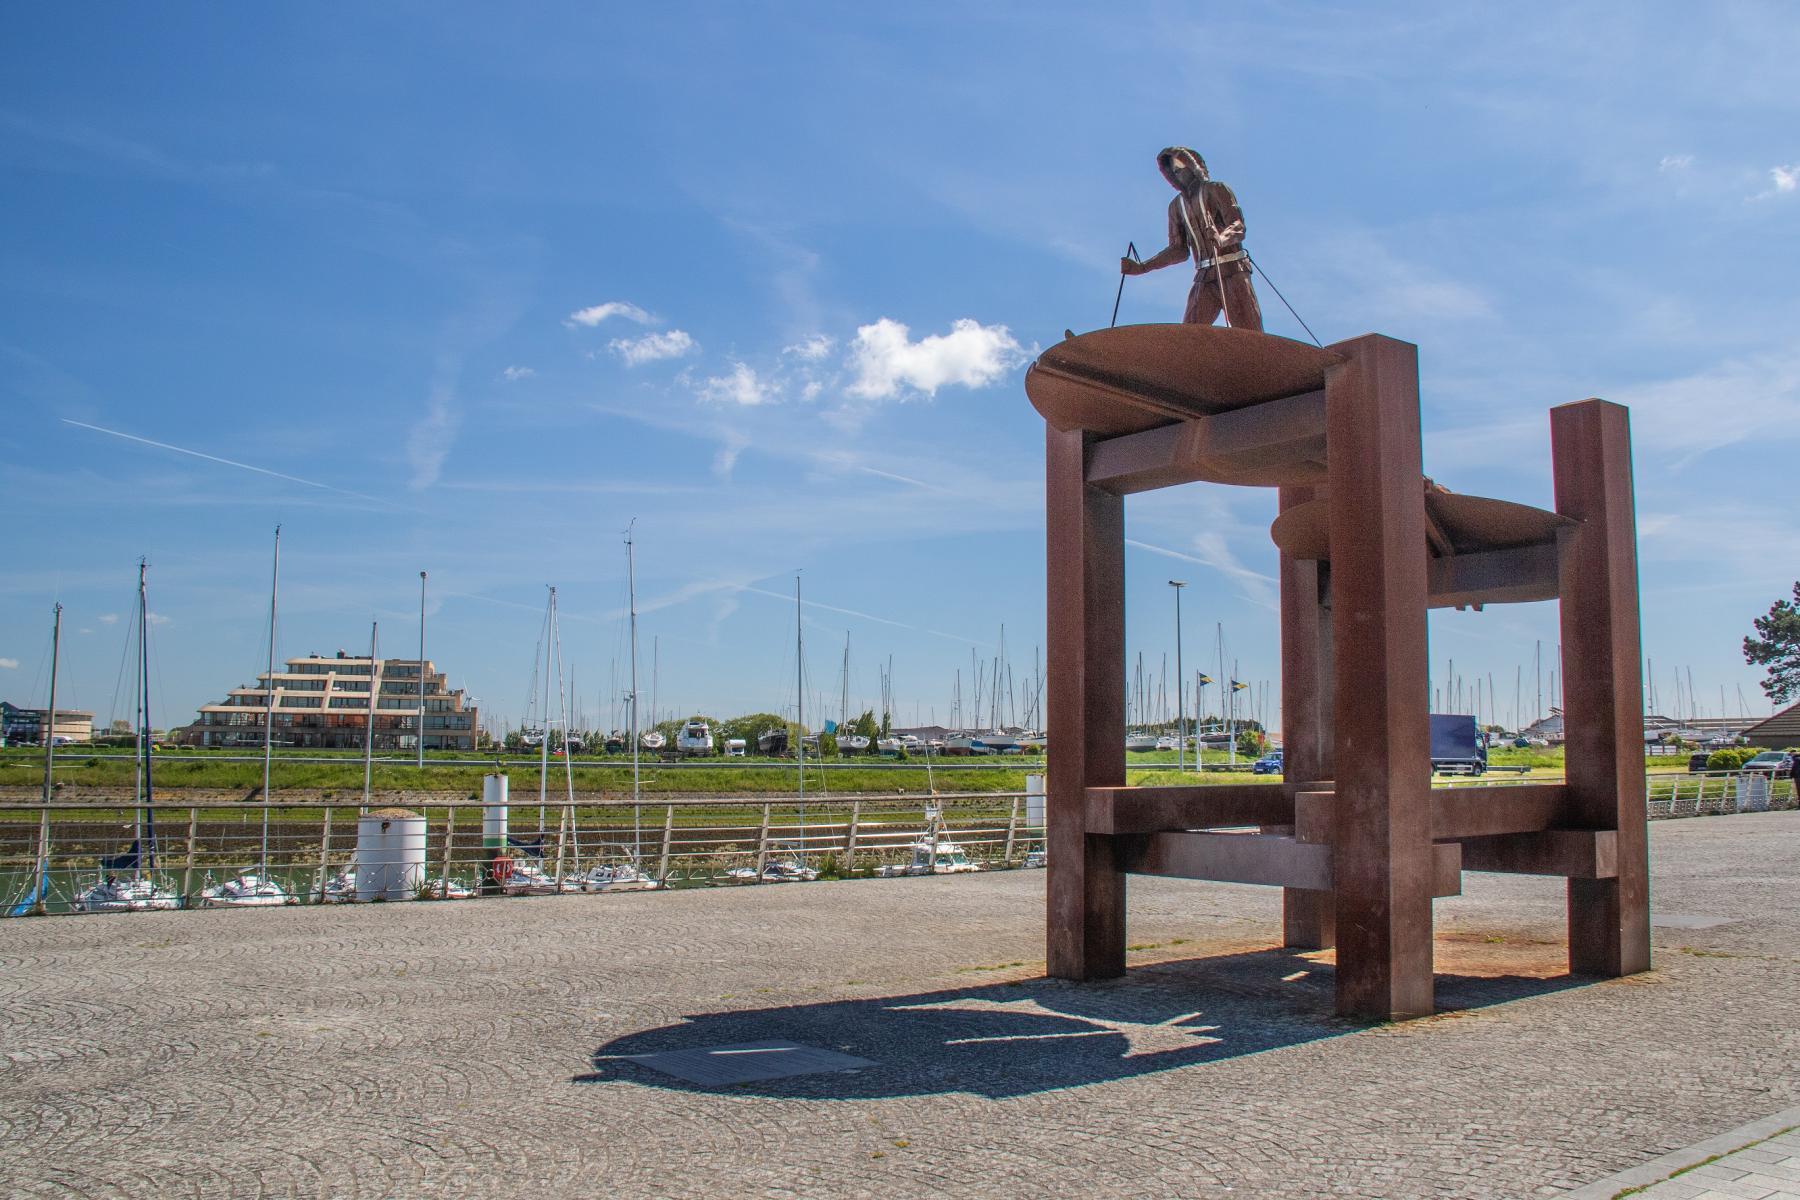 Visit Nieuwpoort The arctic explorer - Freddy Cappon